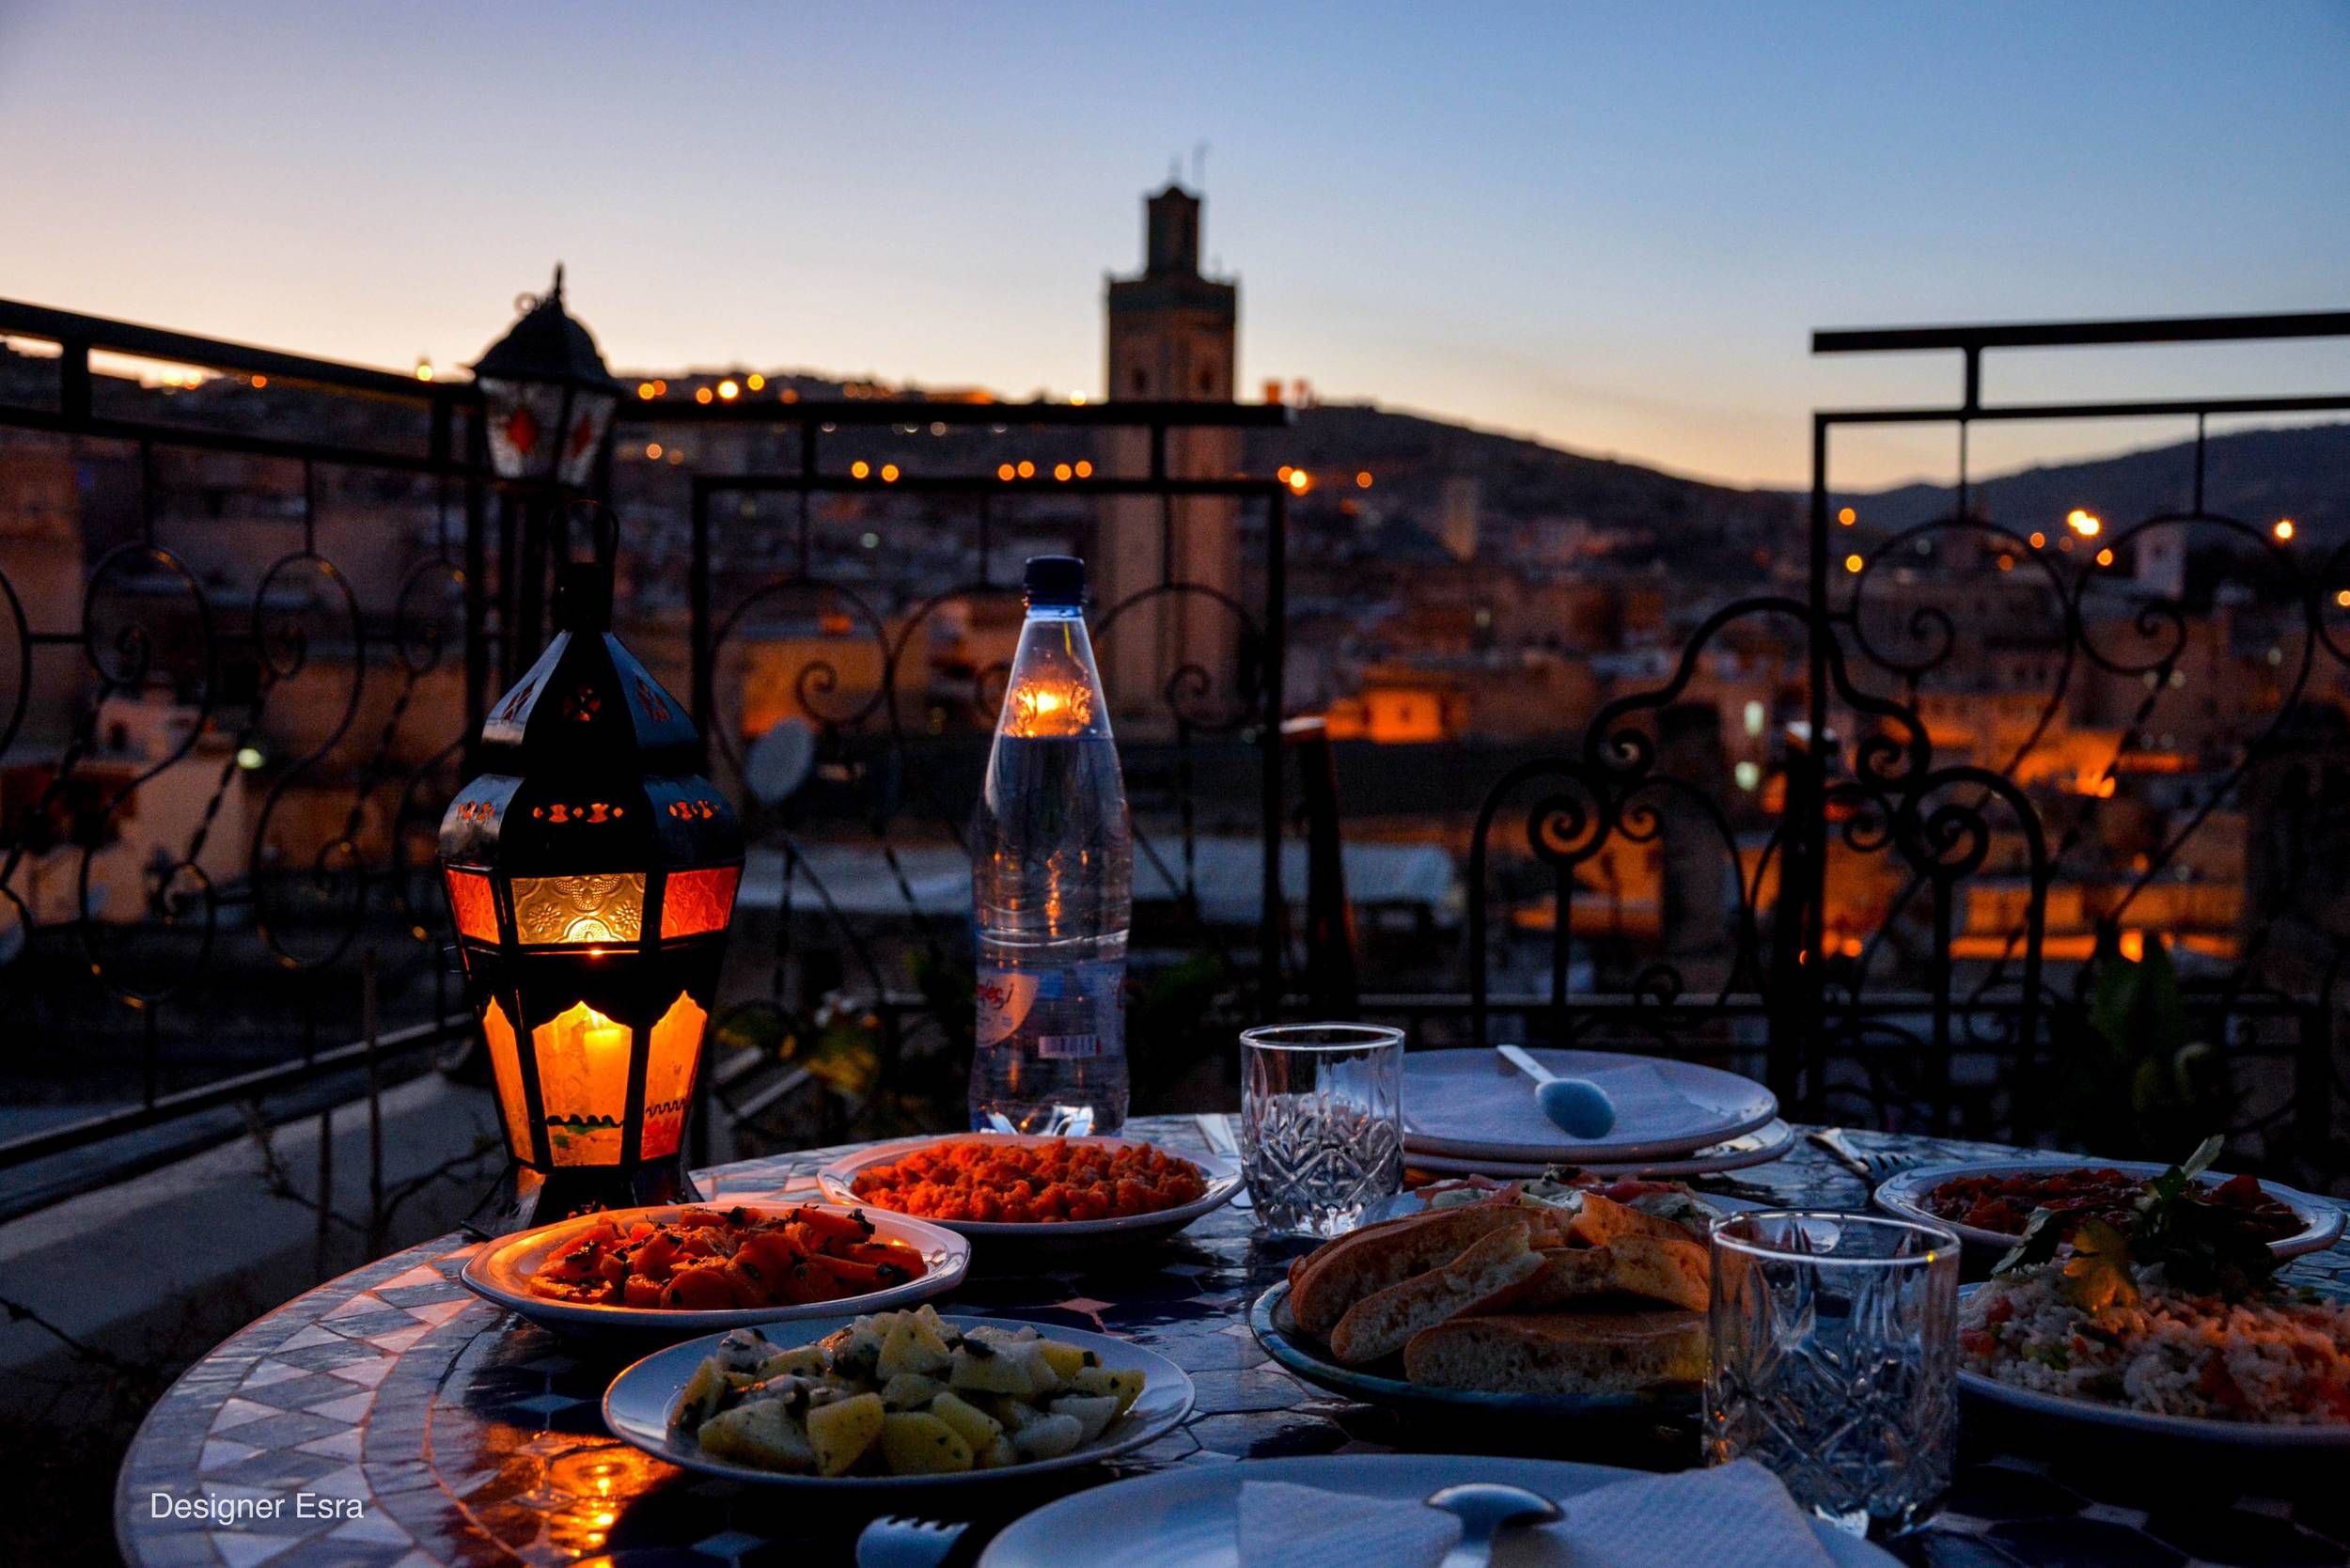 Dinner under the stars in Morocco